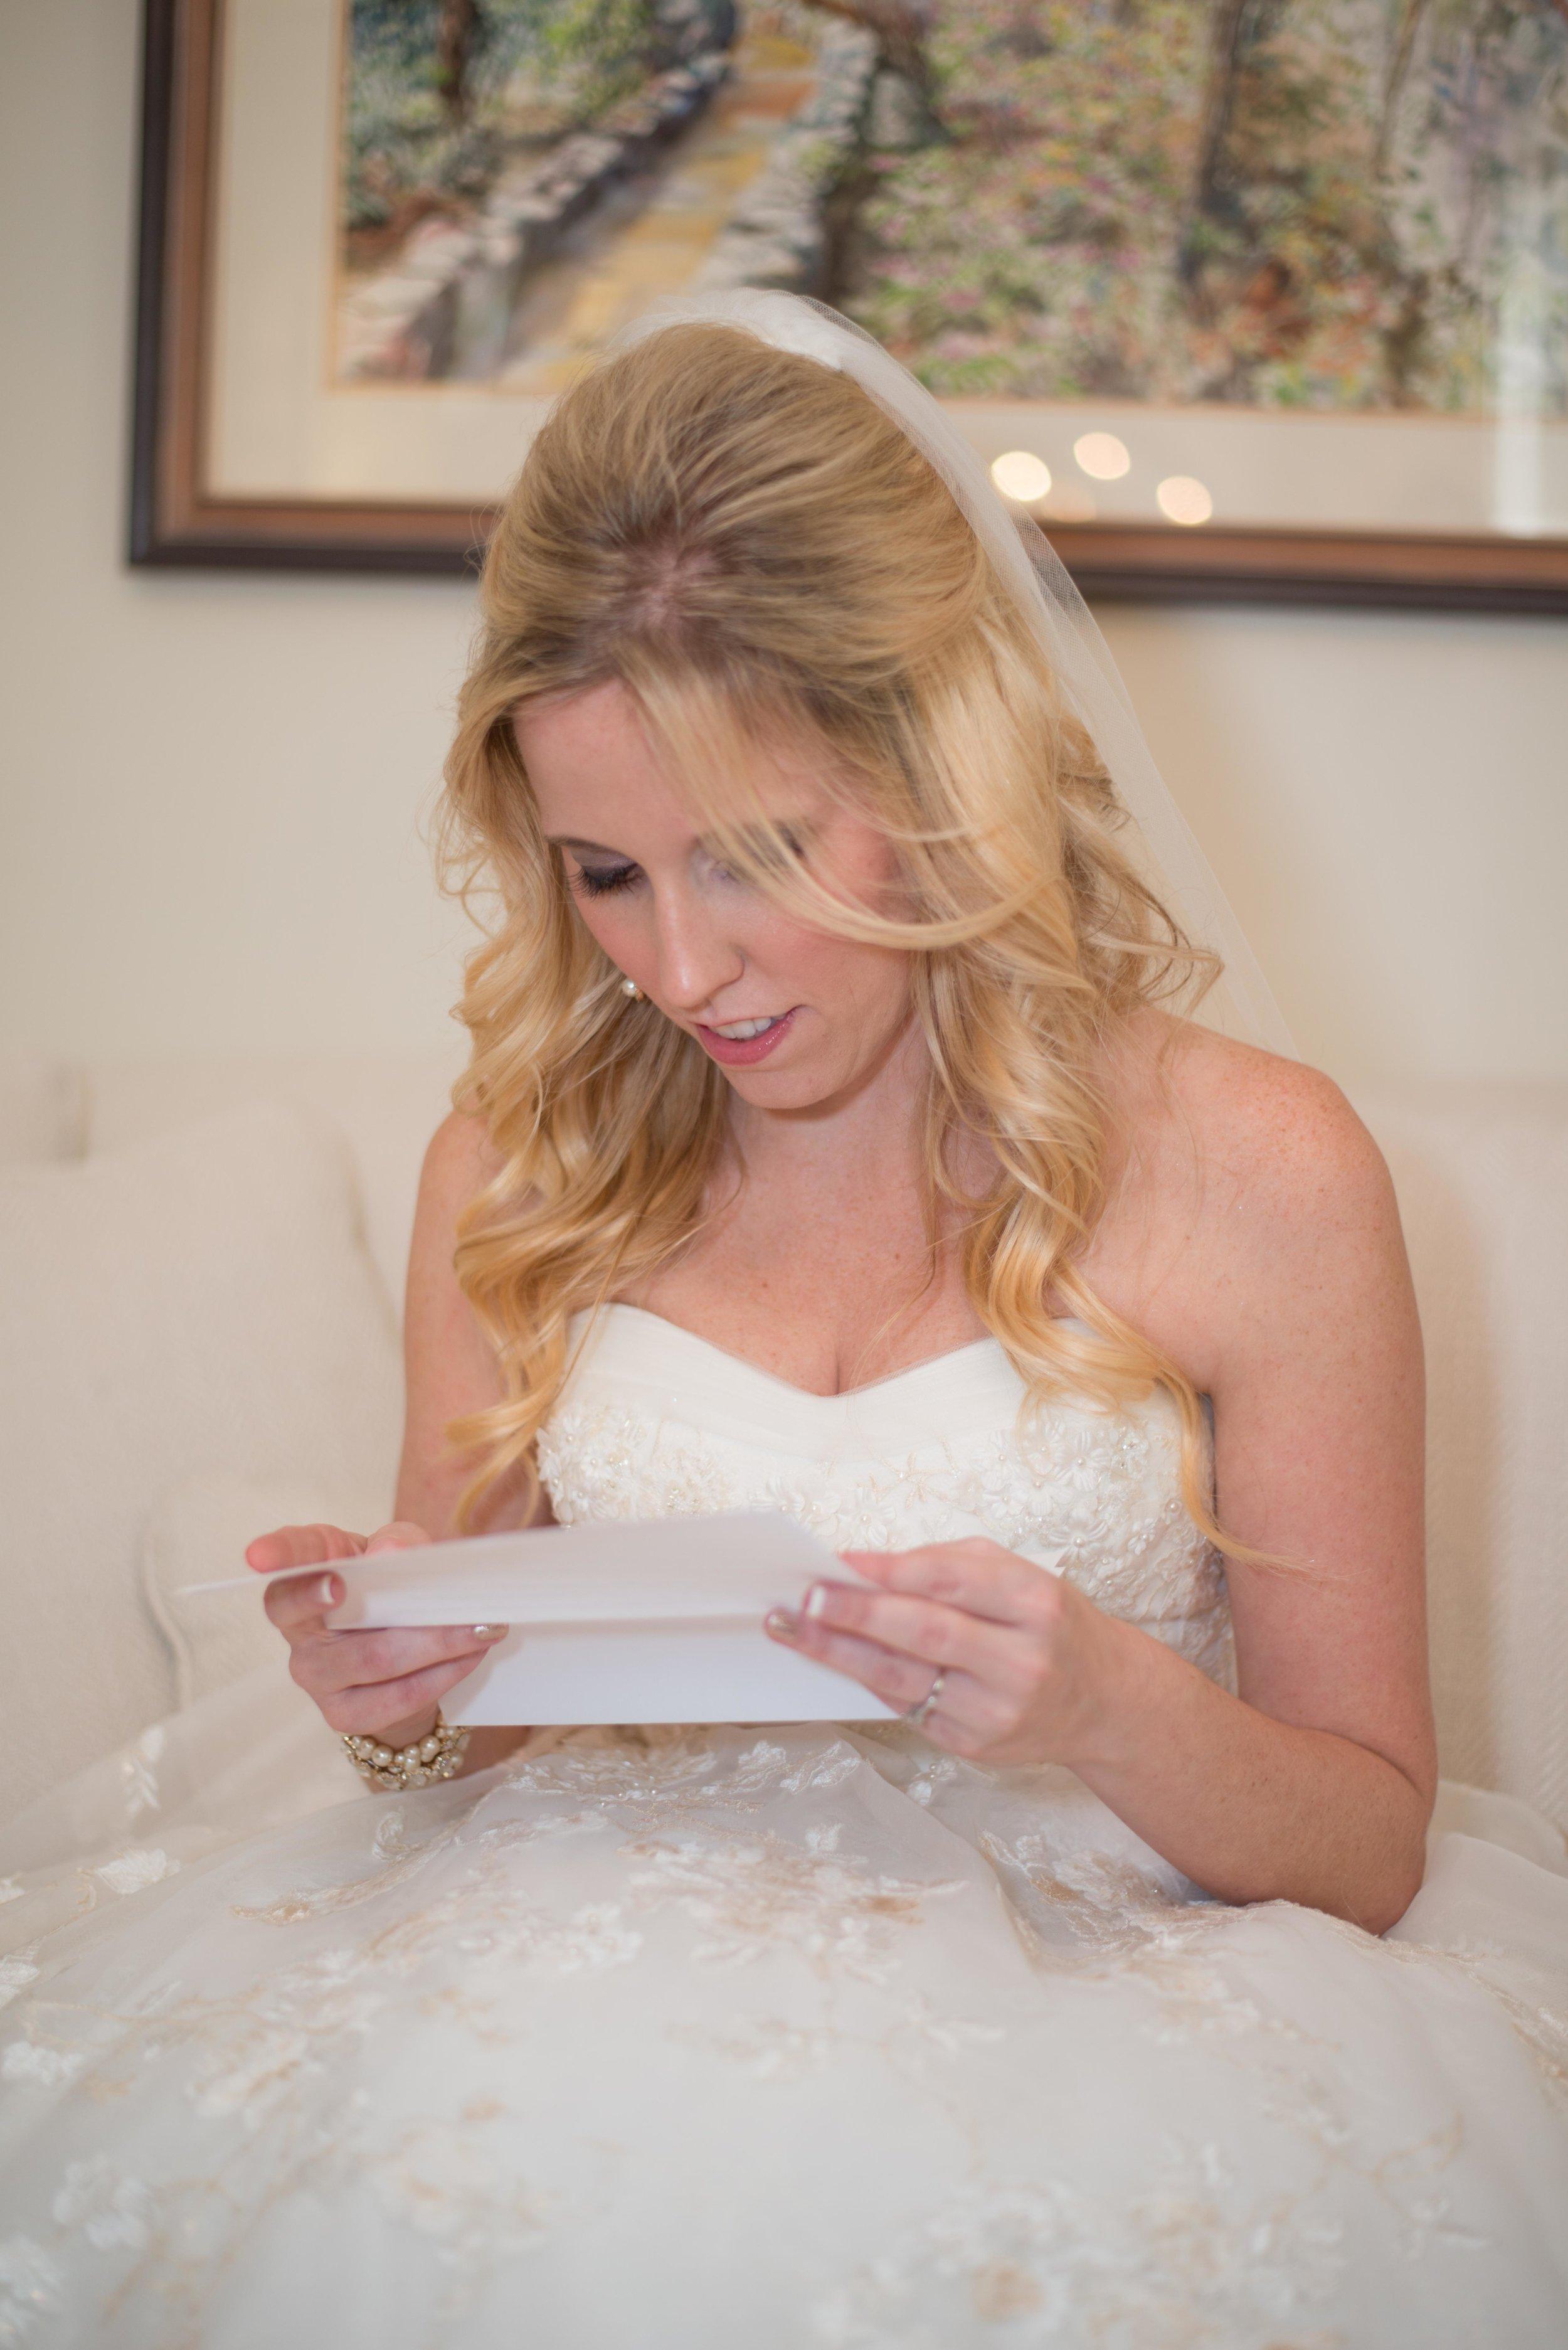 00001_Kuhnert-Wedding-36.jpg